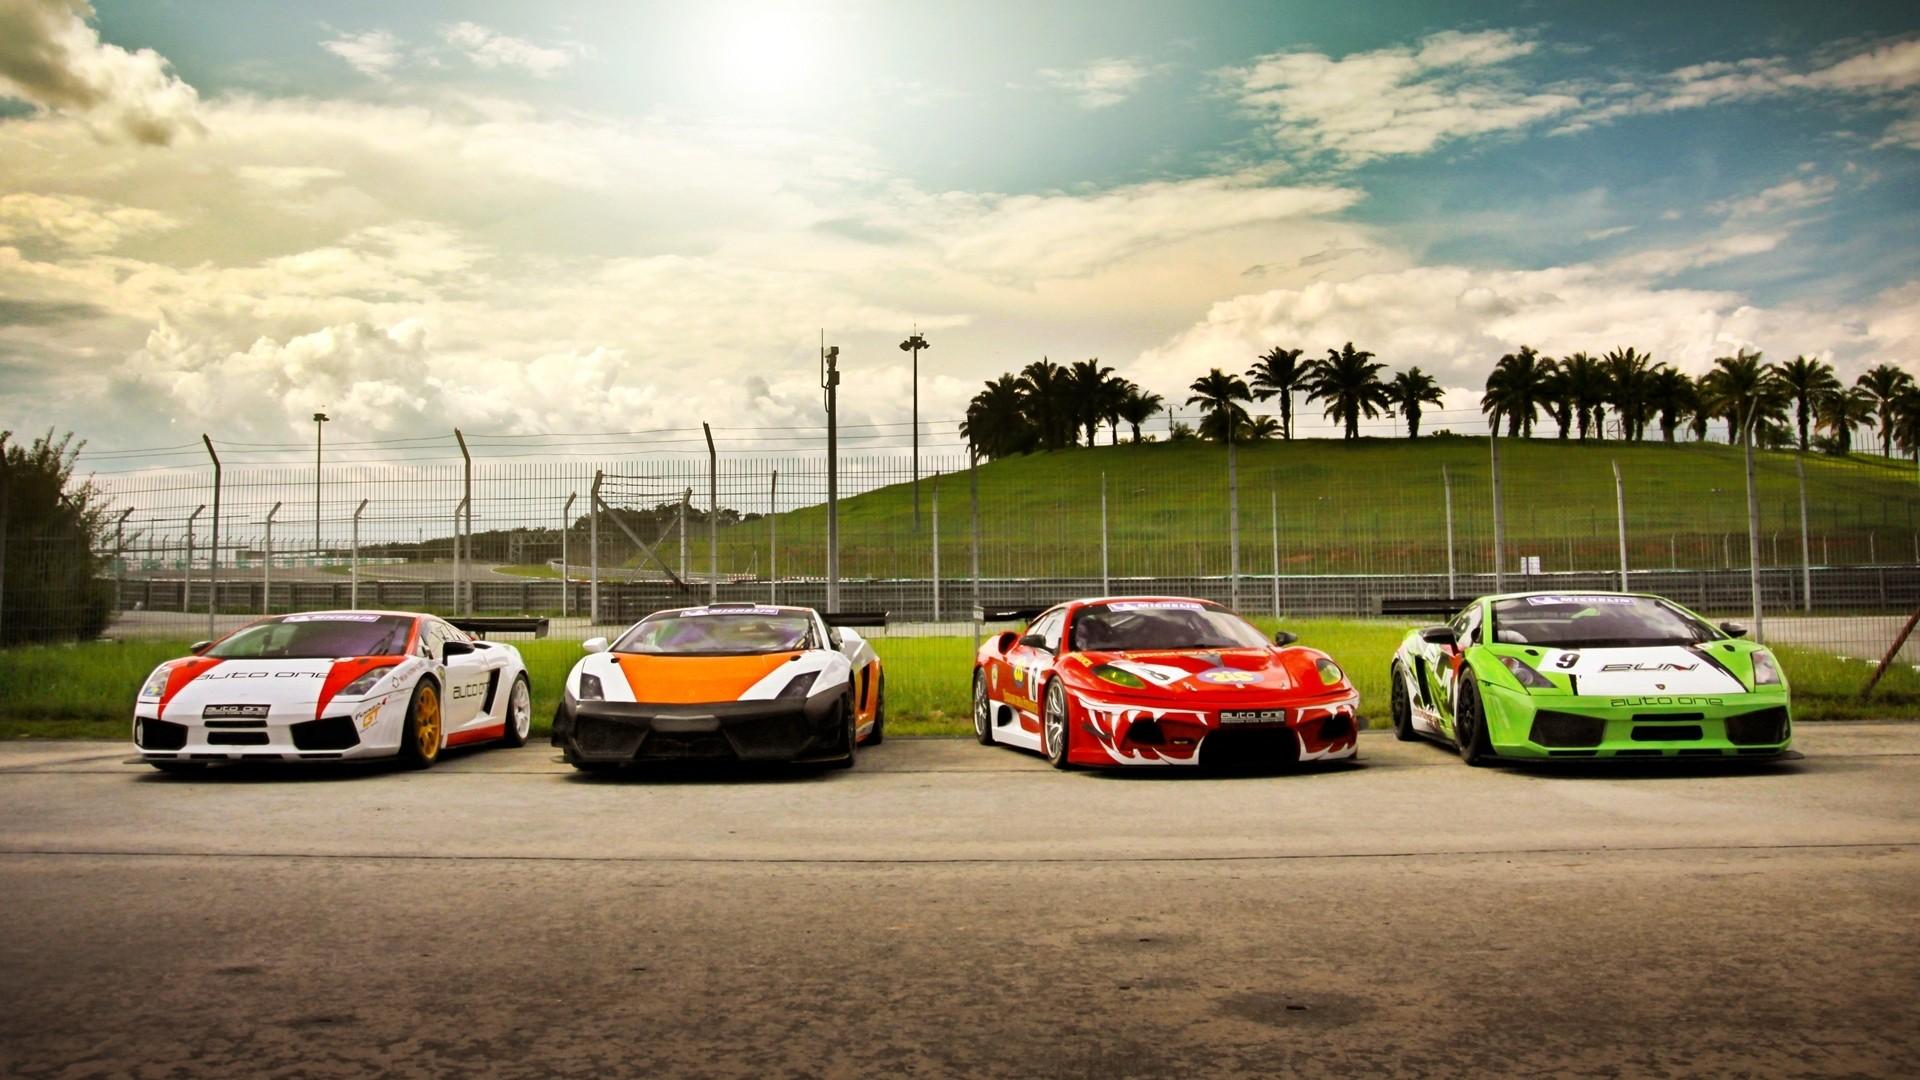 Beautiful Cars Track Lamborghini Gallardo Sports Cars Skyscapes Ferrari F430 Racing  Cars Gt3 Wallpaper | 1920x1080 | 227140 | WallpaperUP